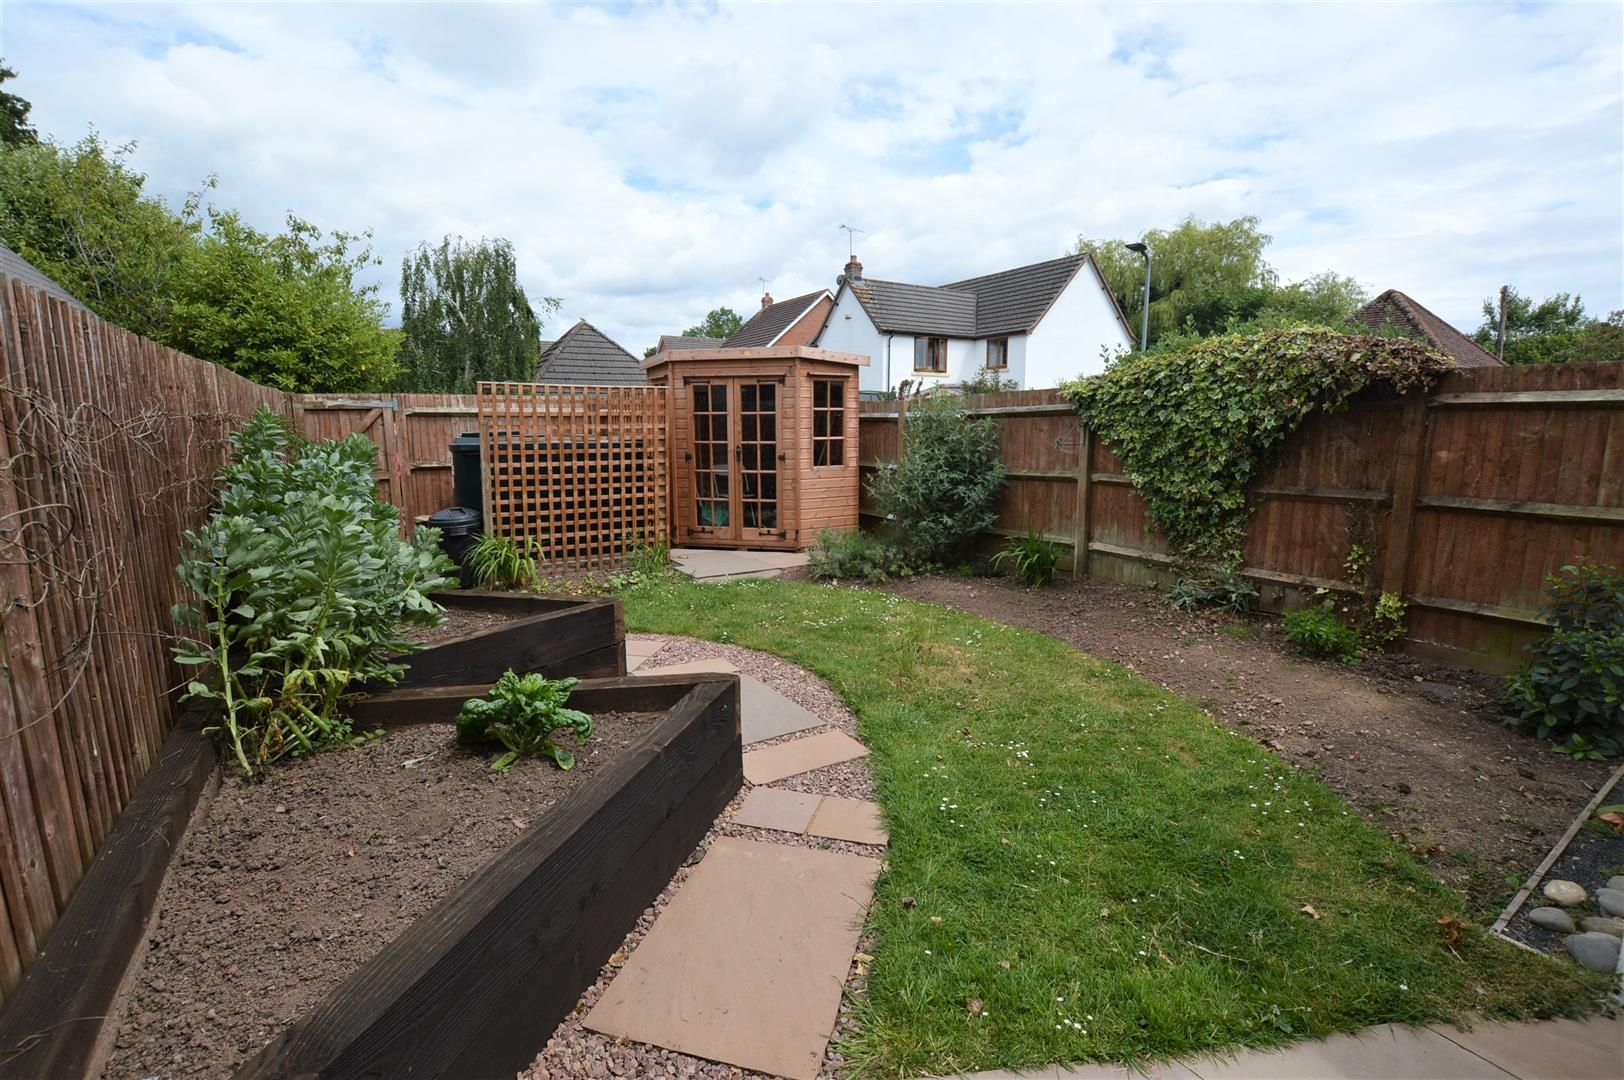 3 bed terraced for sale in Eardisley  - Property Image 6